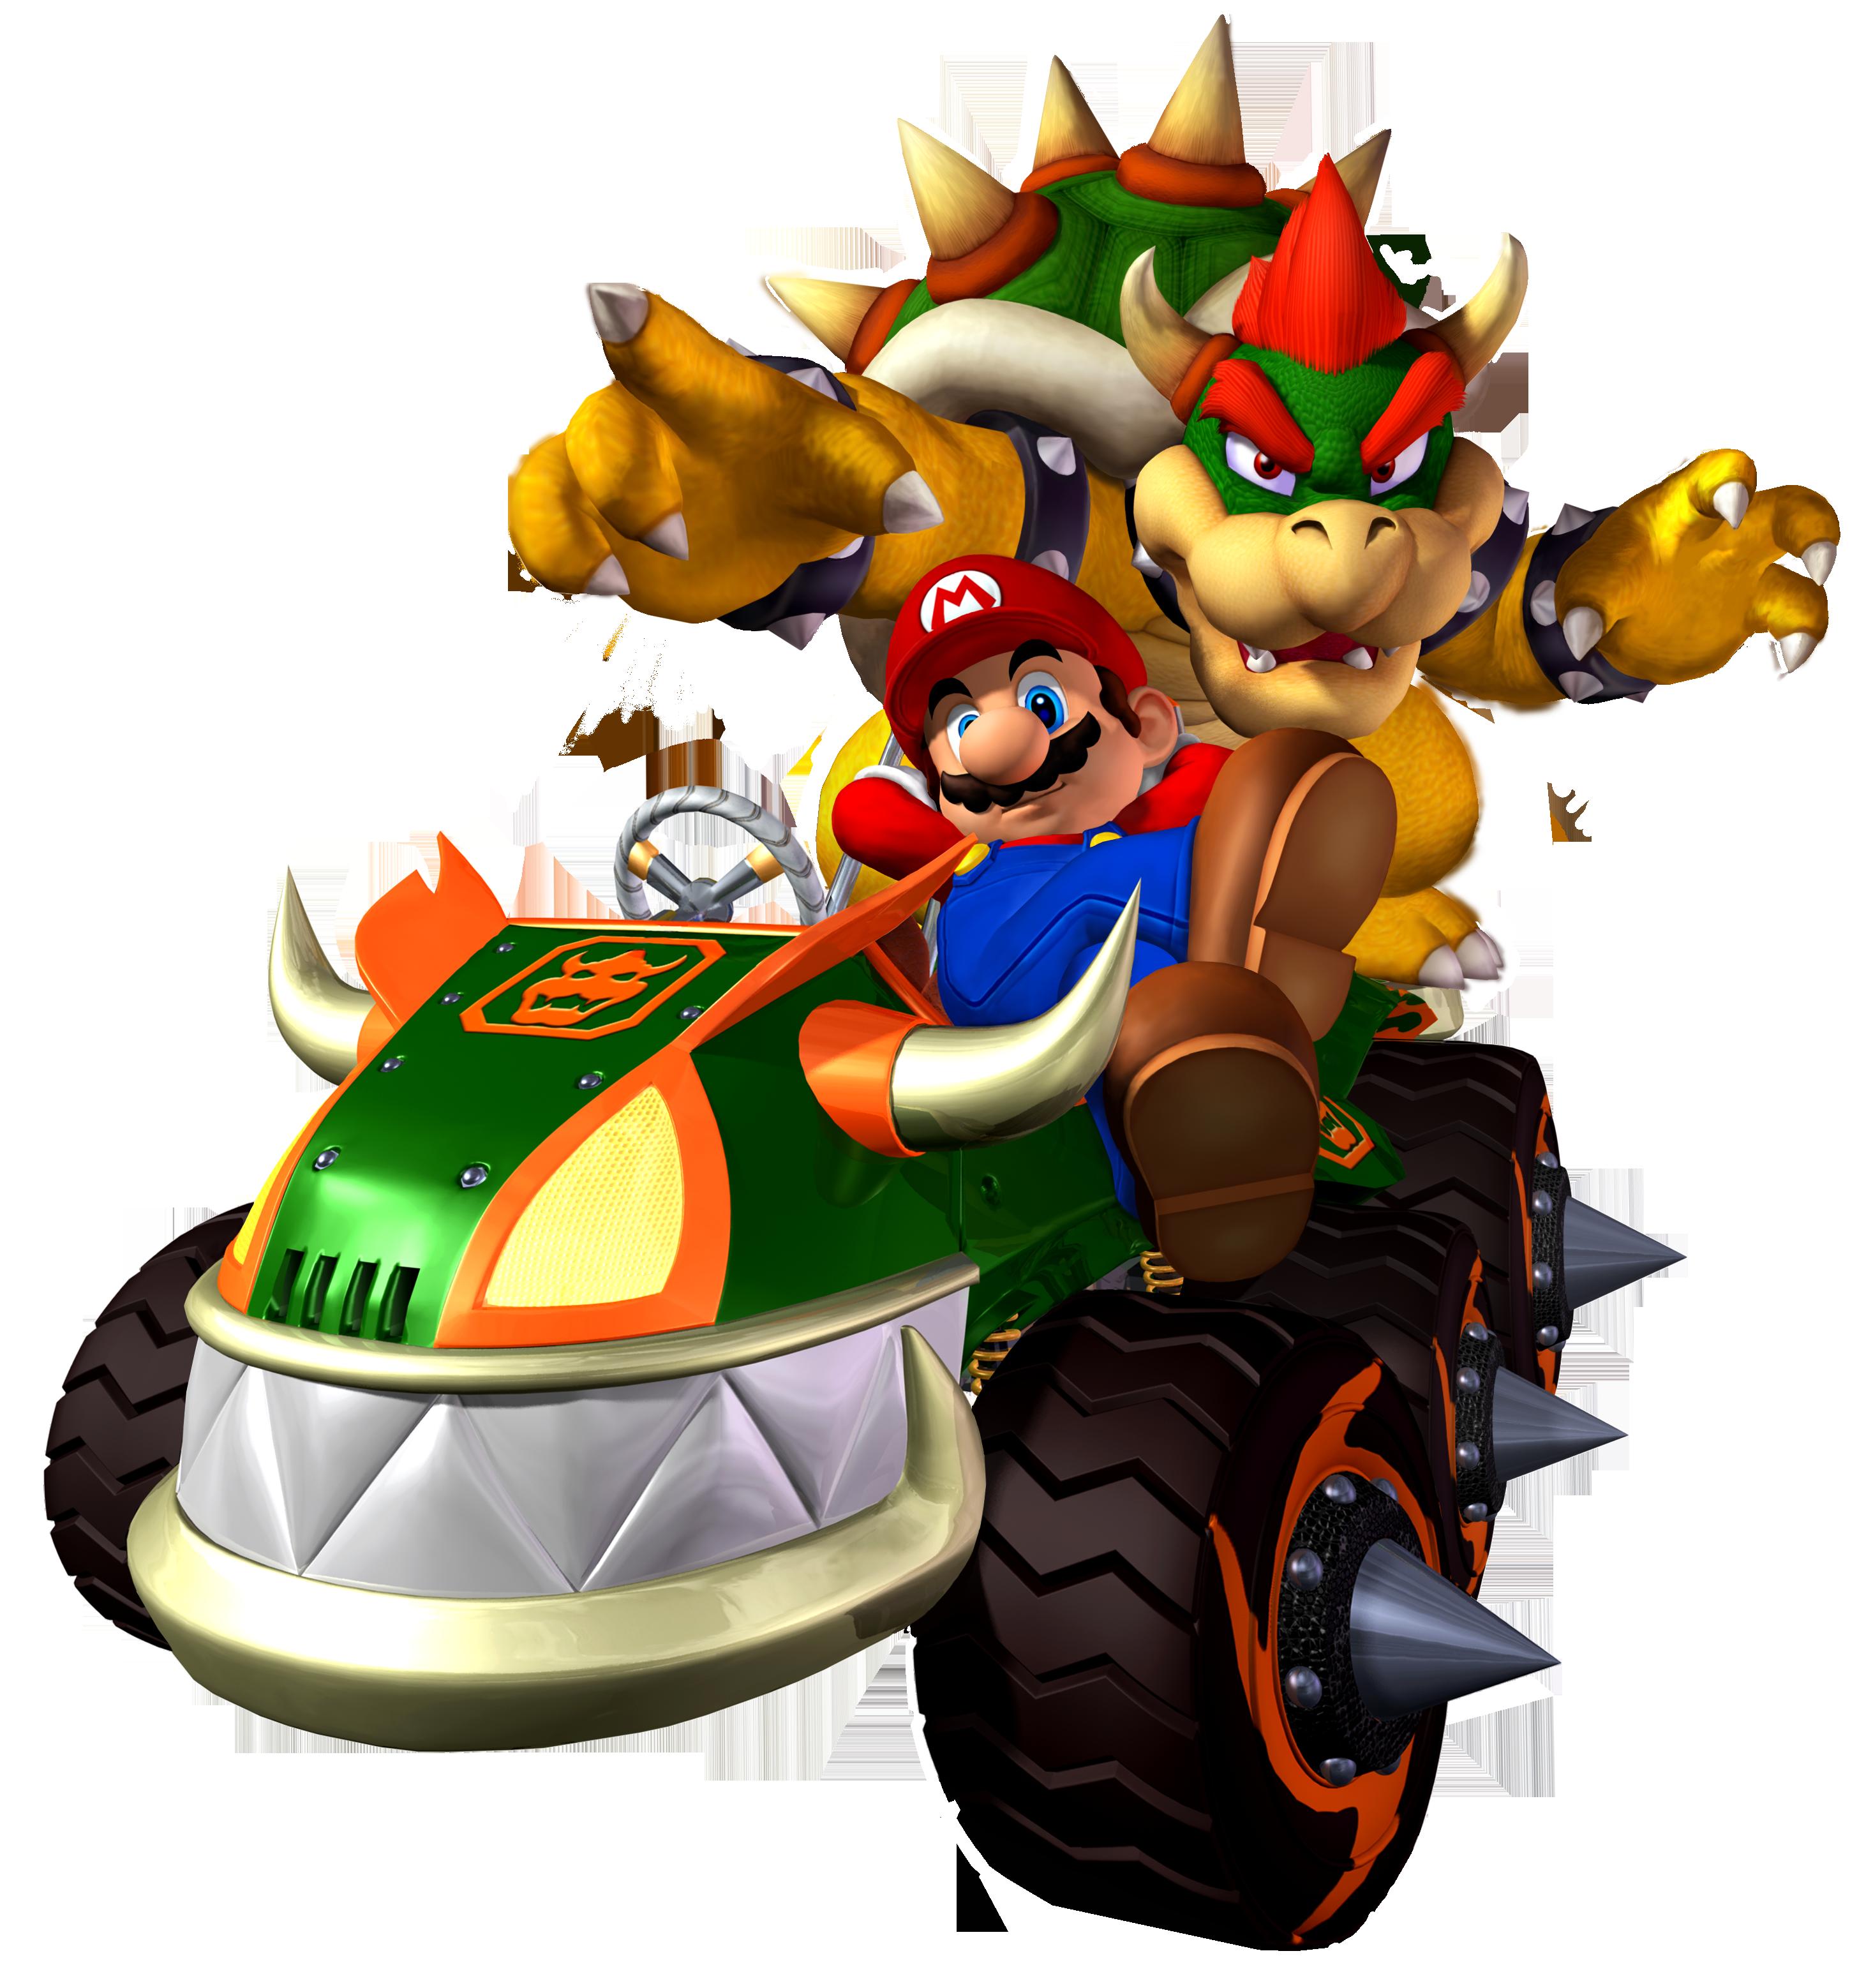 Mario Amp Bowser Mario Kart Know Your Meme